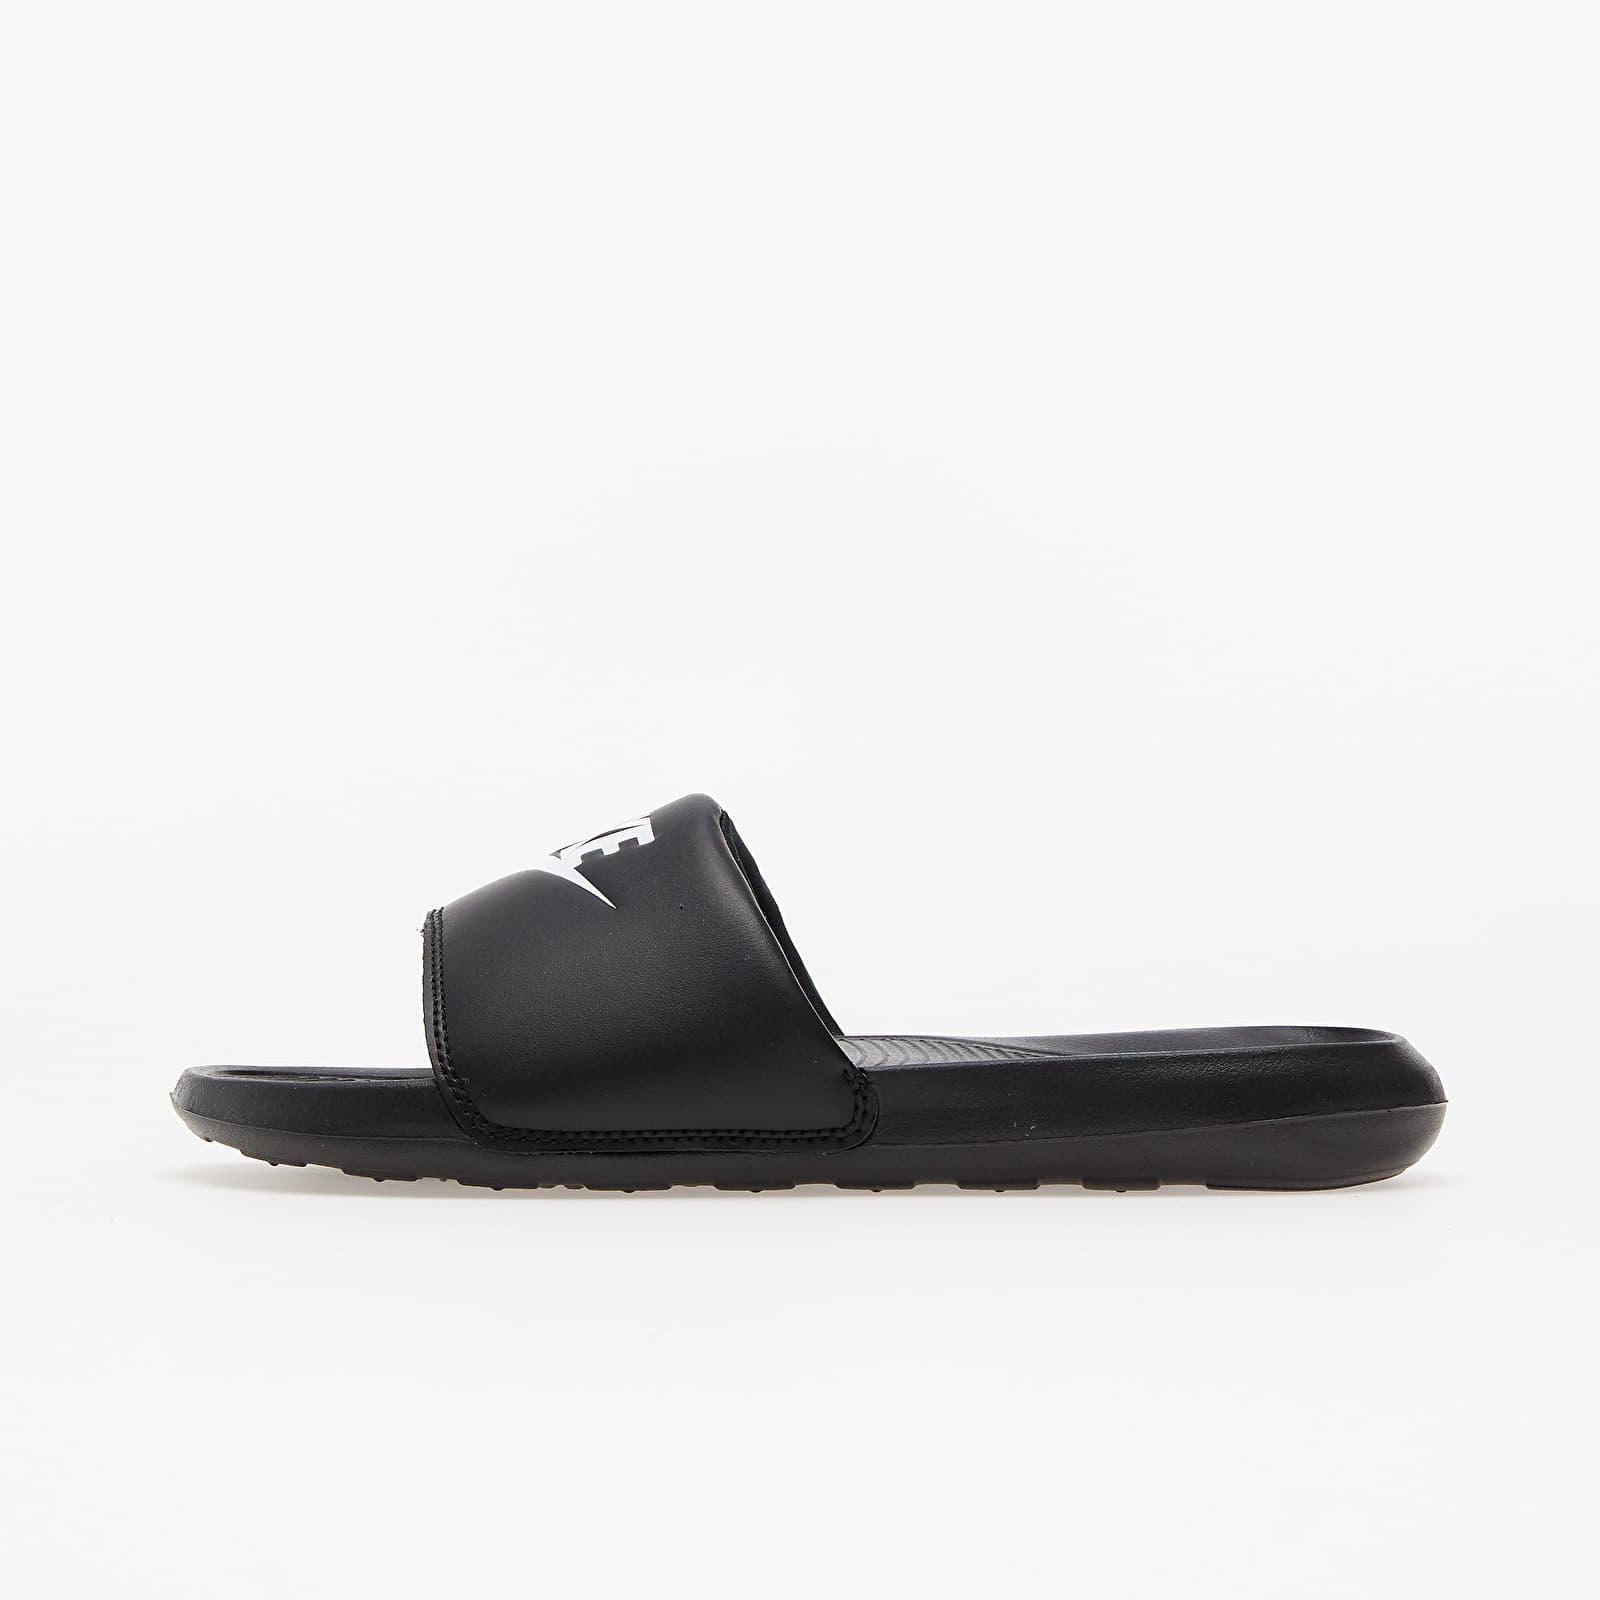 Nike W Victori One Slide Black/ White-Black EUR 40.5